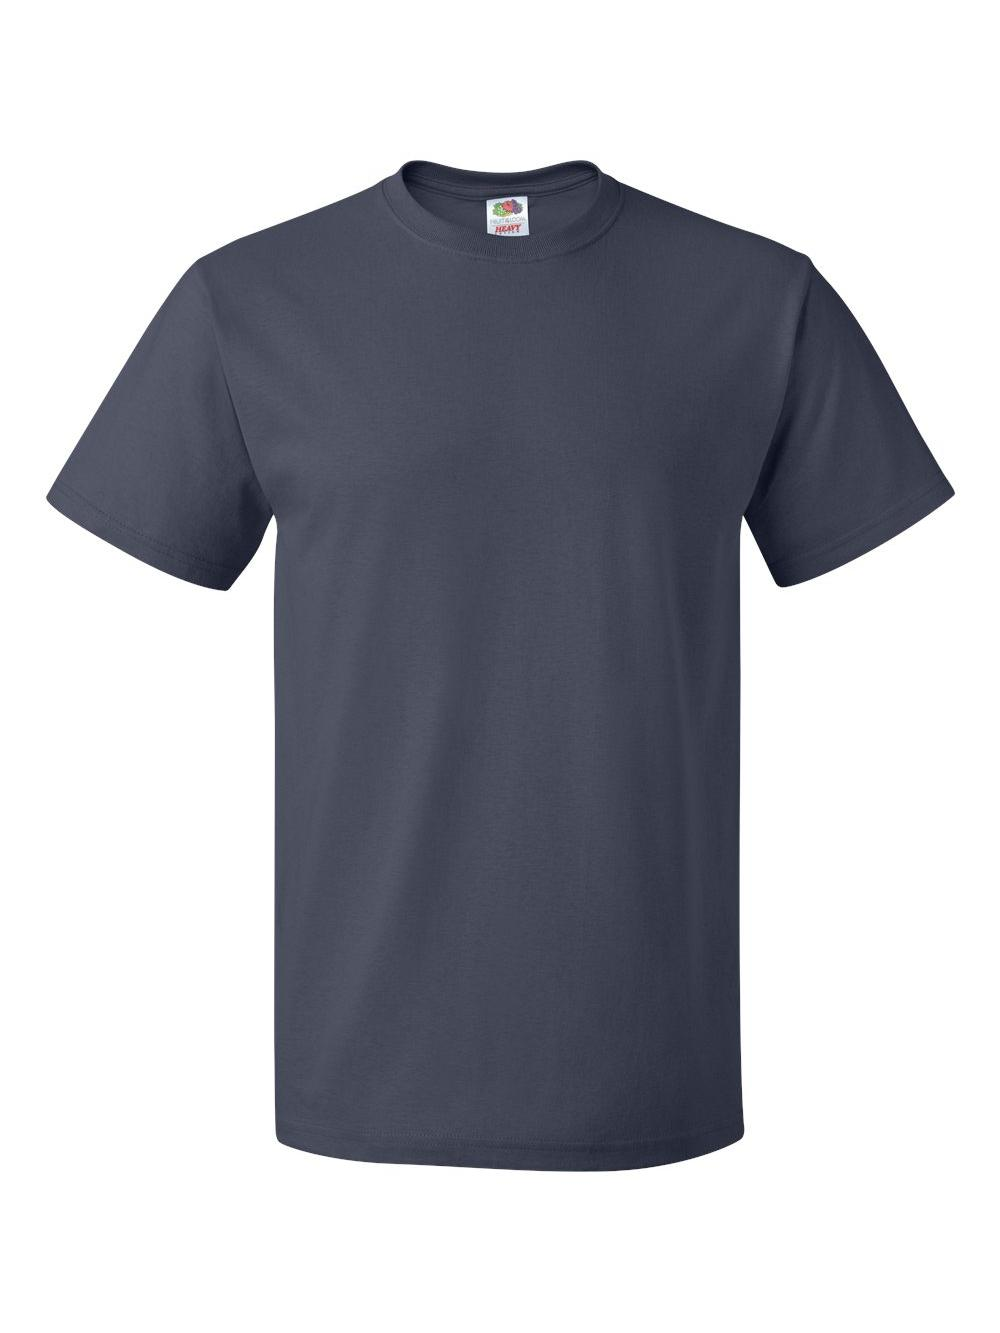 Fruit-of-the-Loom-HD-Cotton-Short-Sleeve-T-Shirt-3930R thumbnail 60